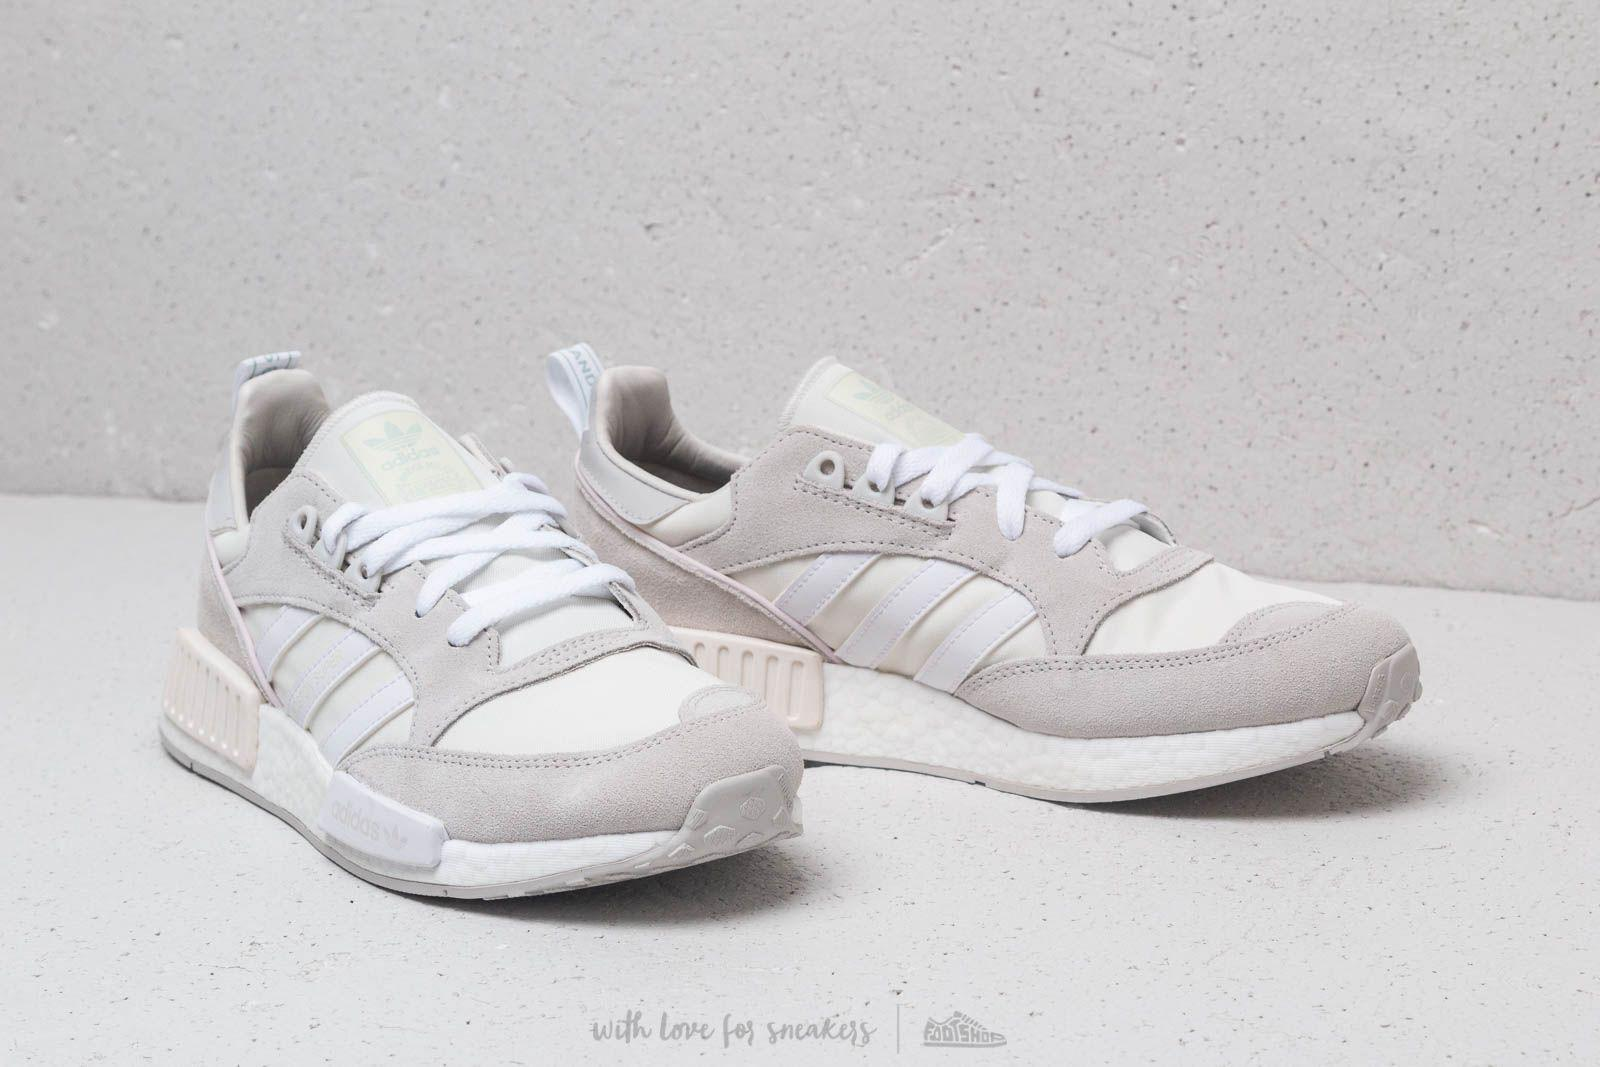 Adidas Boston Super X R1 Cloud White Ftw White Grey One